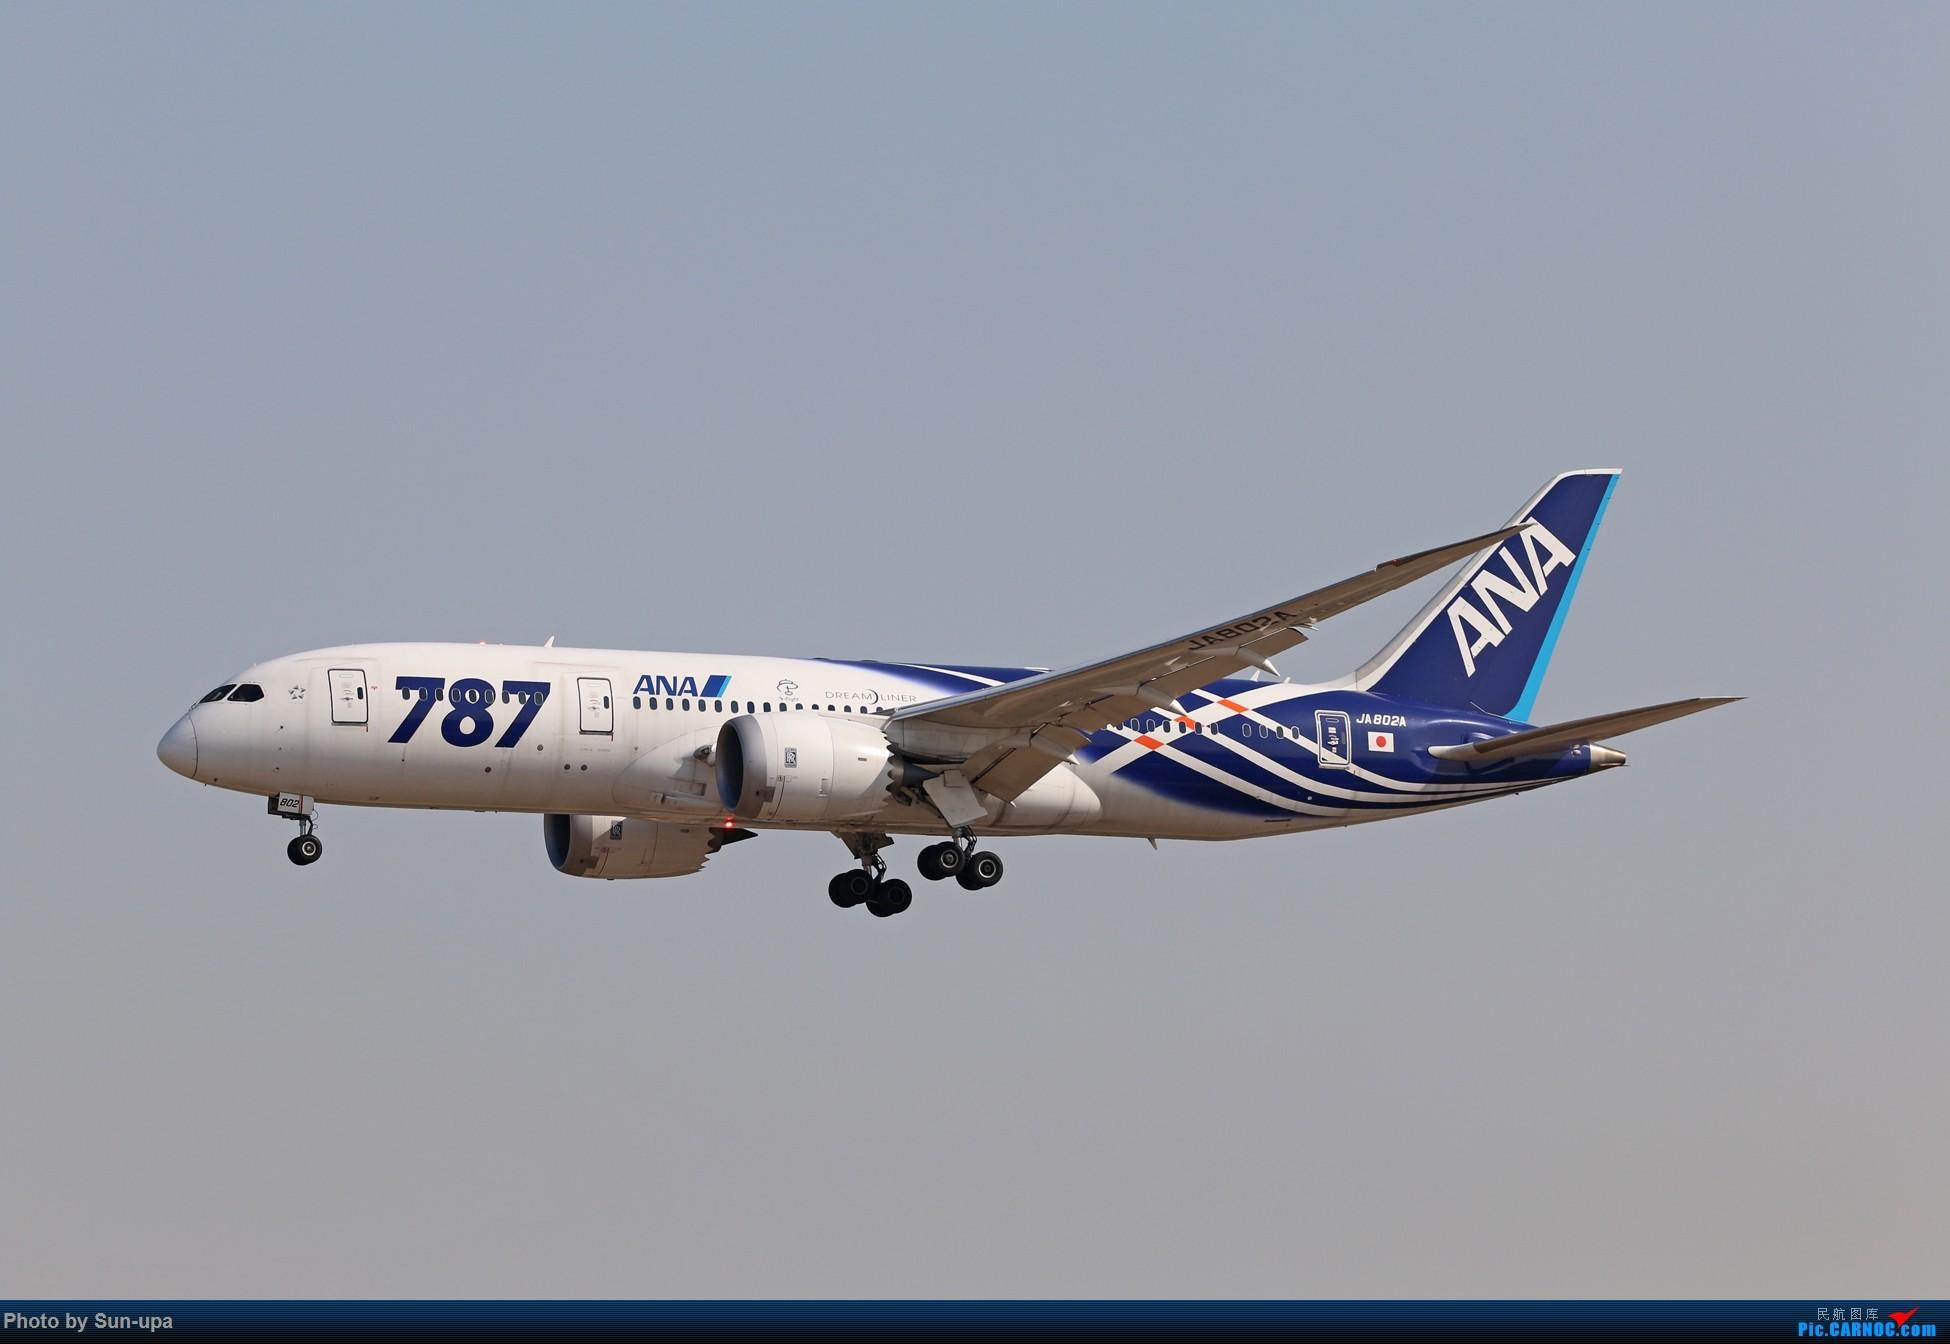 Re:[原创]2014.2.23 PEK JA802A落地组图 BOEING 787 JA802A 中国北京首都国际机场